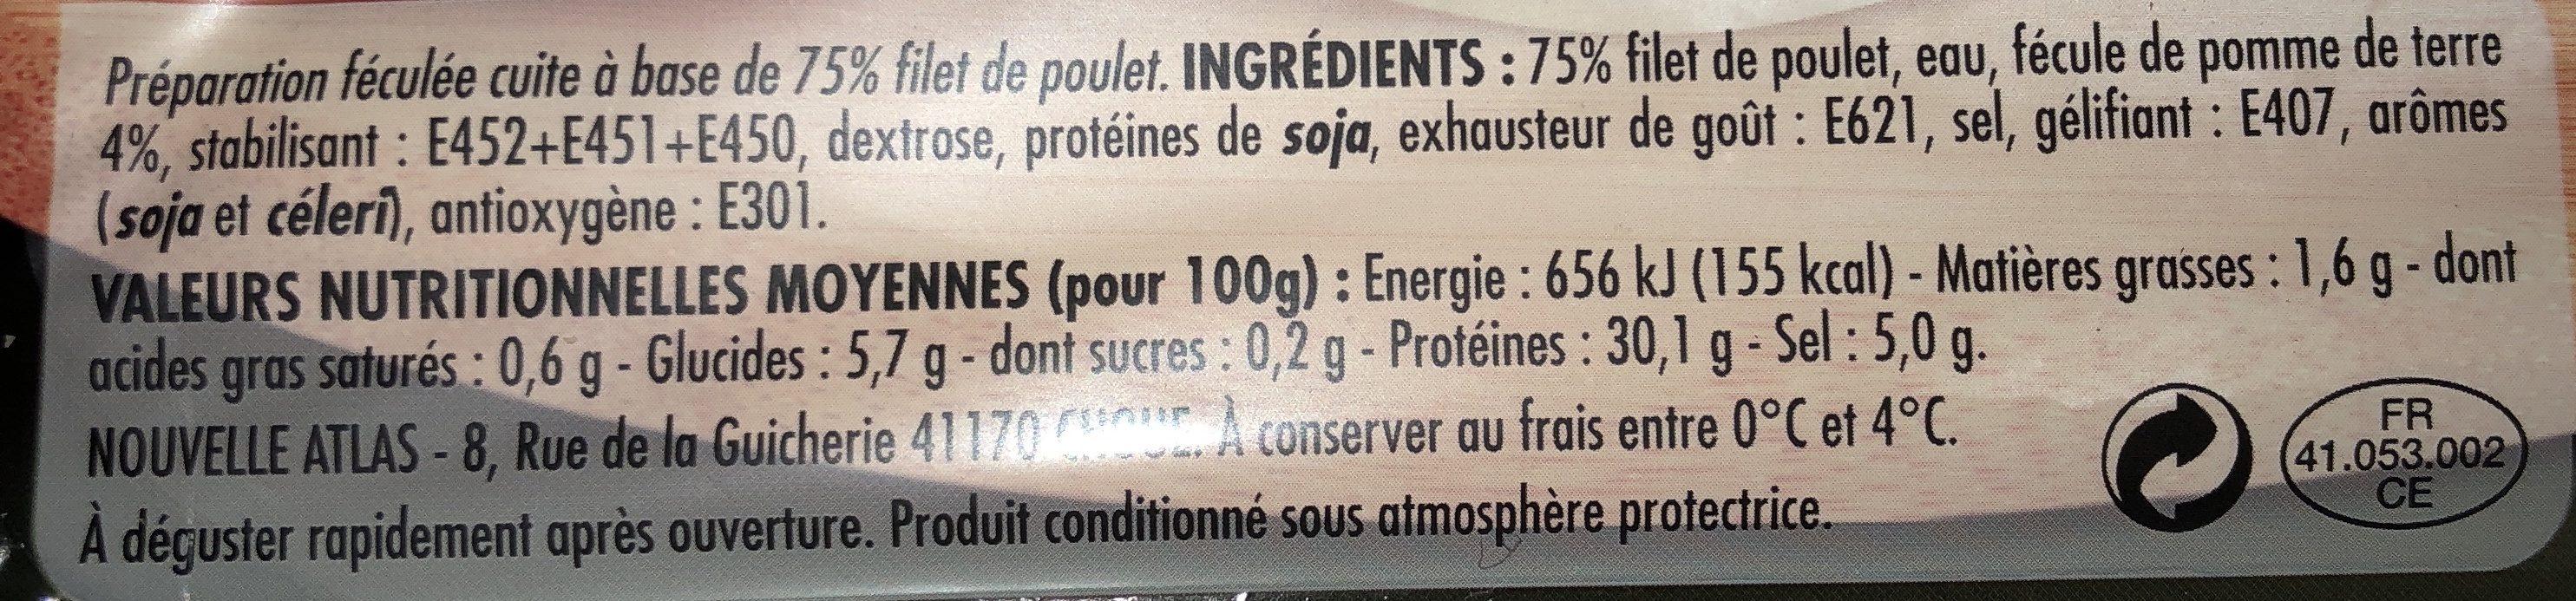 Delice de poulet - Ingrediënten - fr